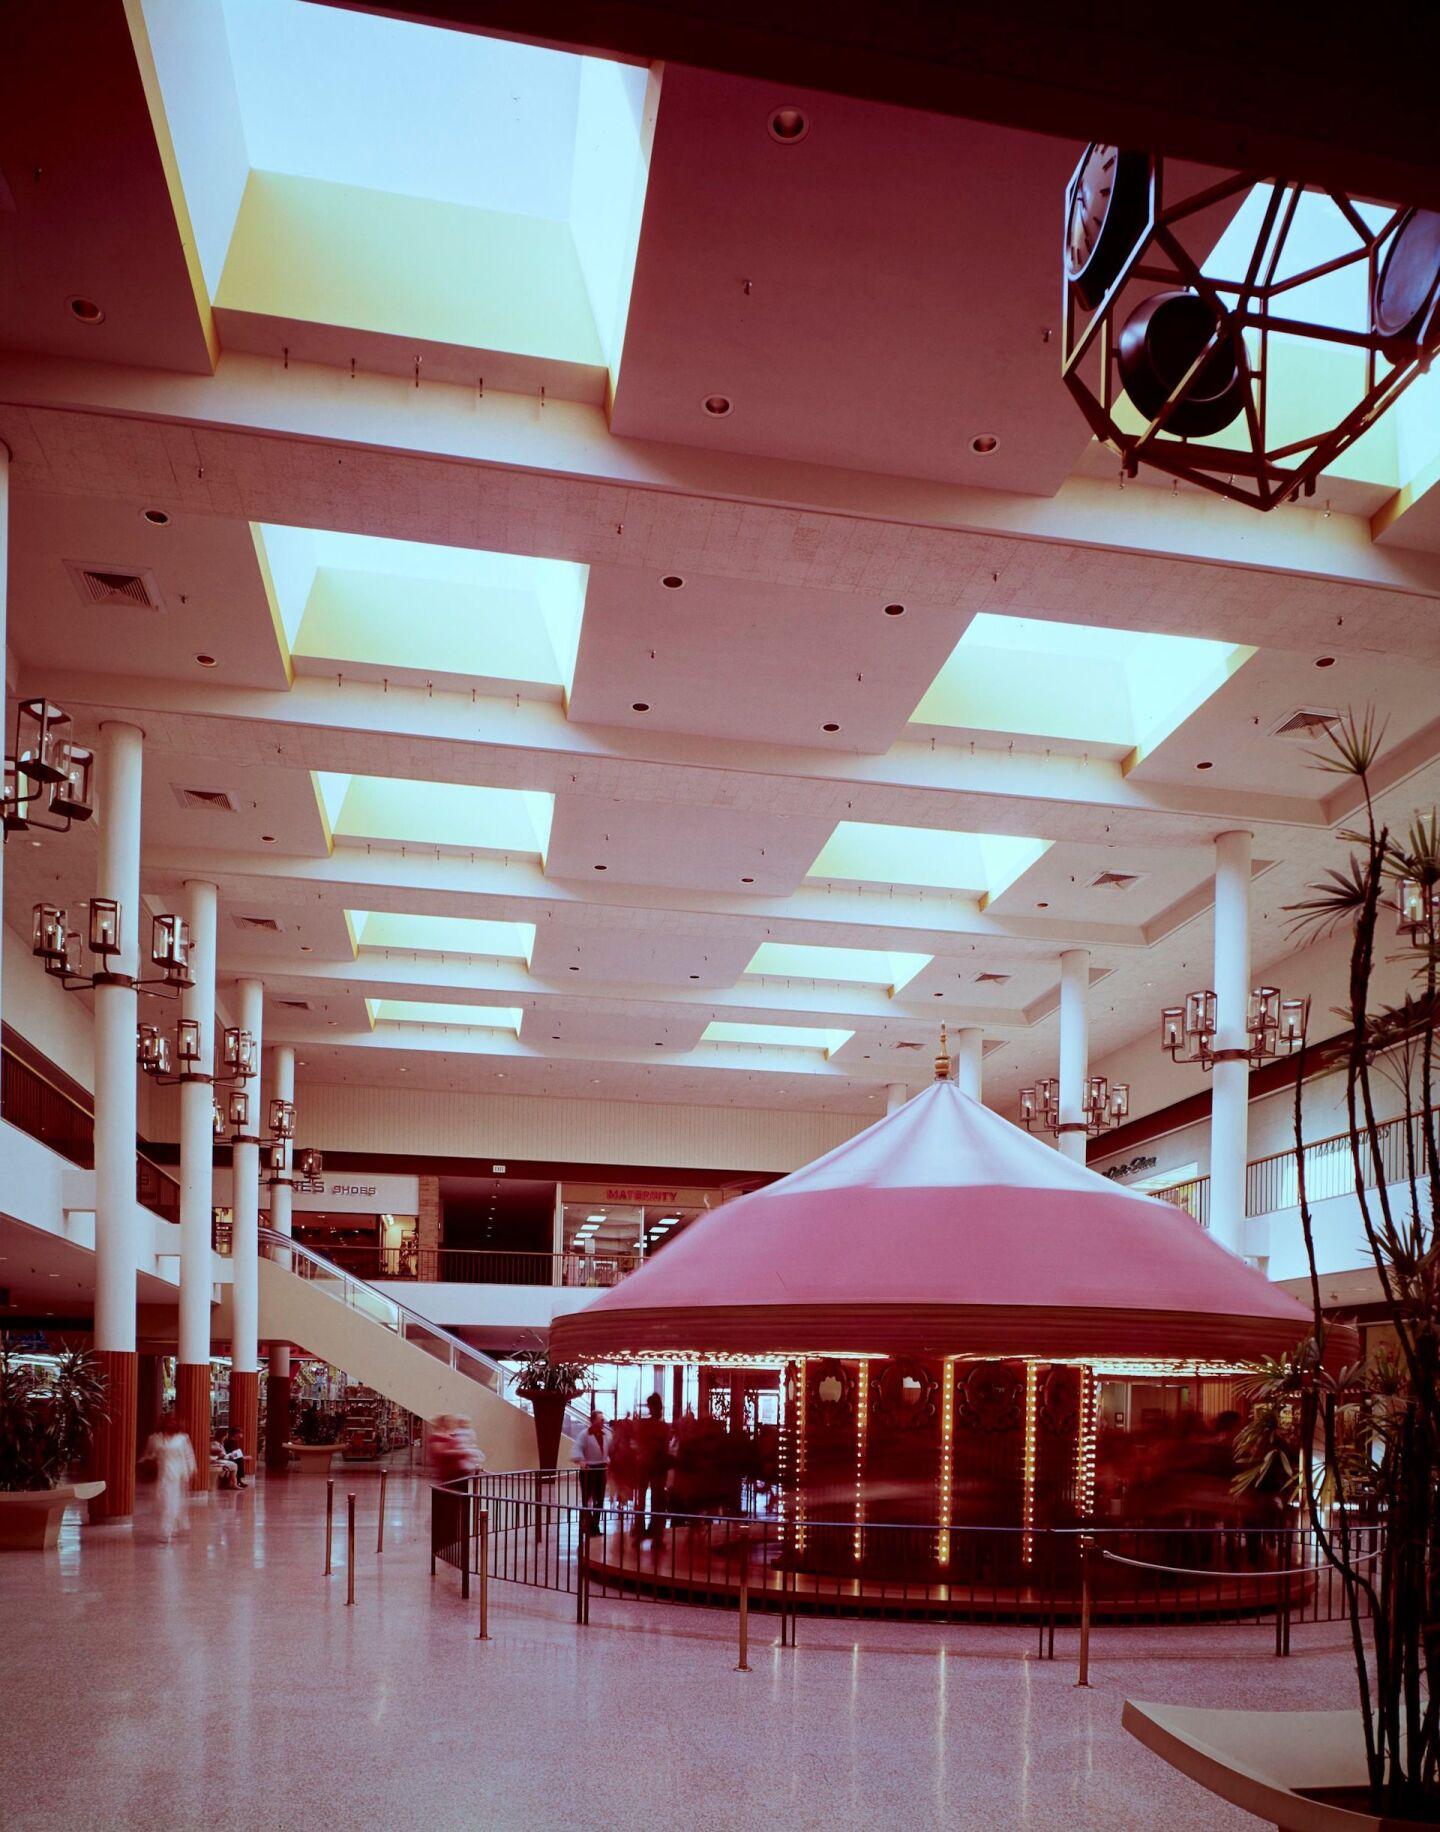 South Coast Plaza interior